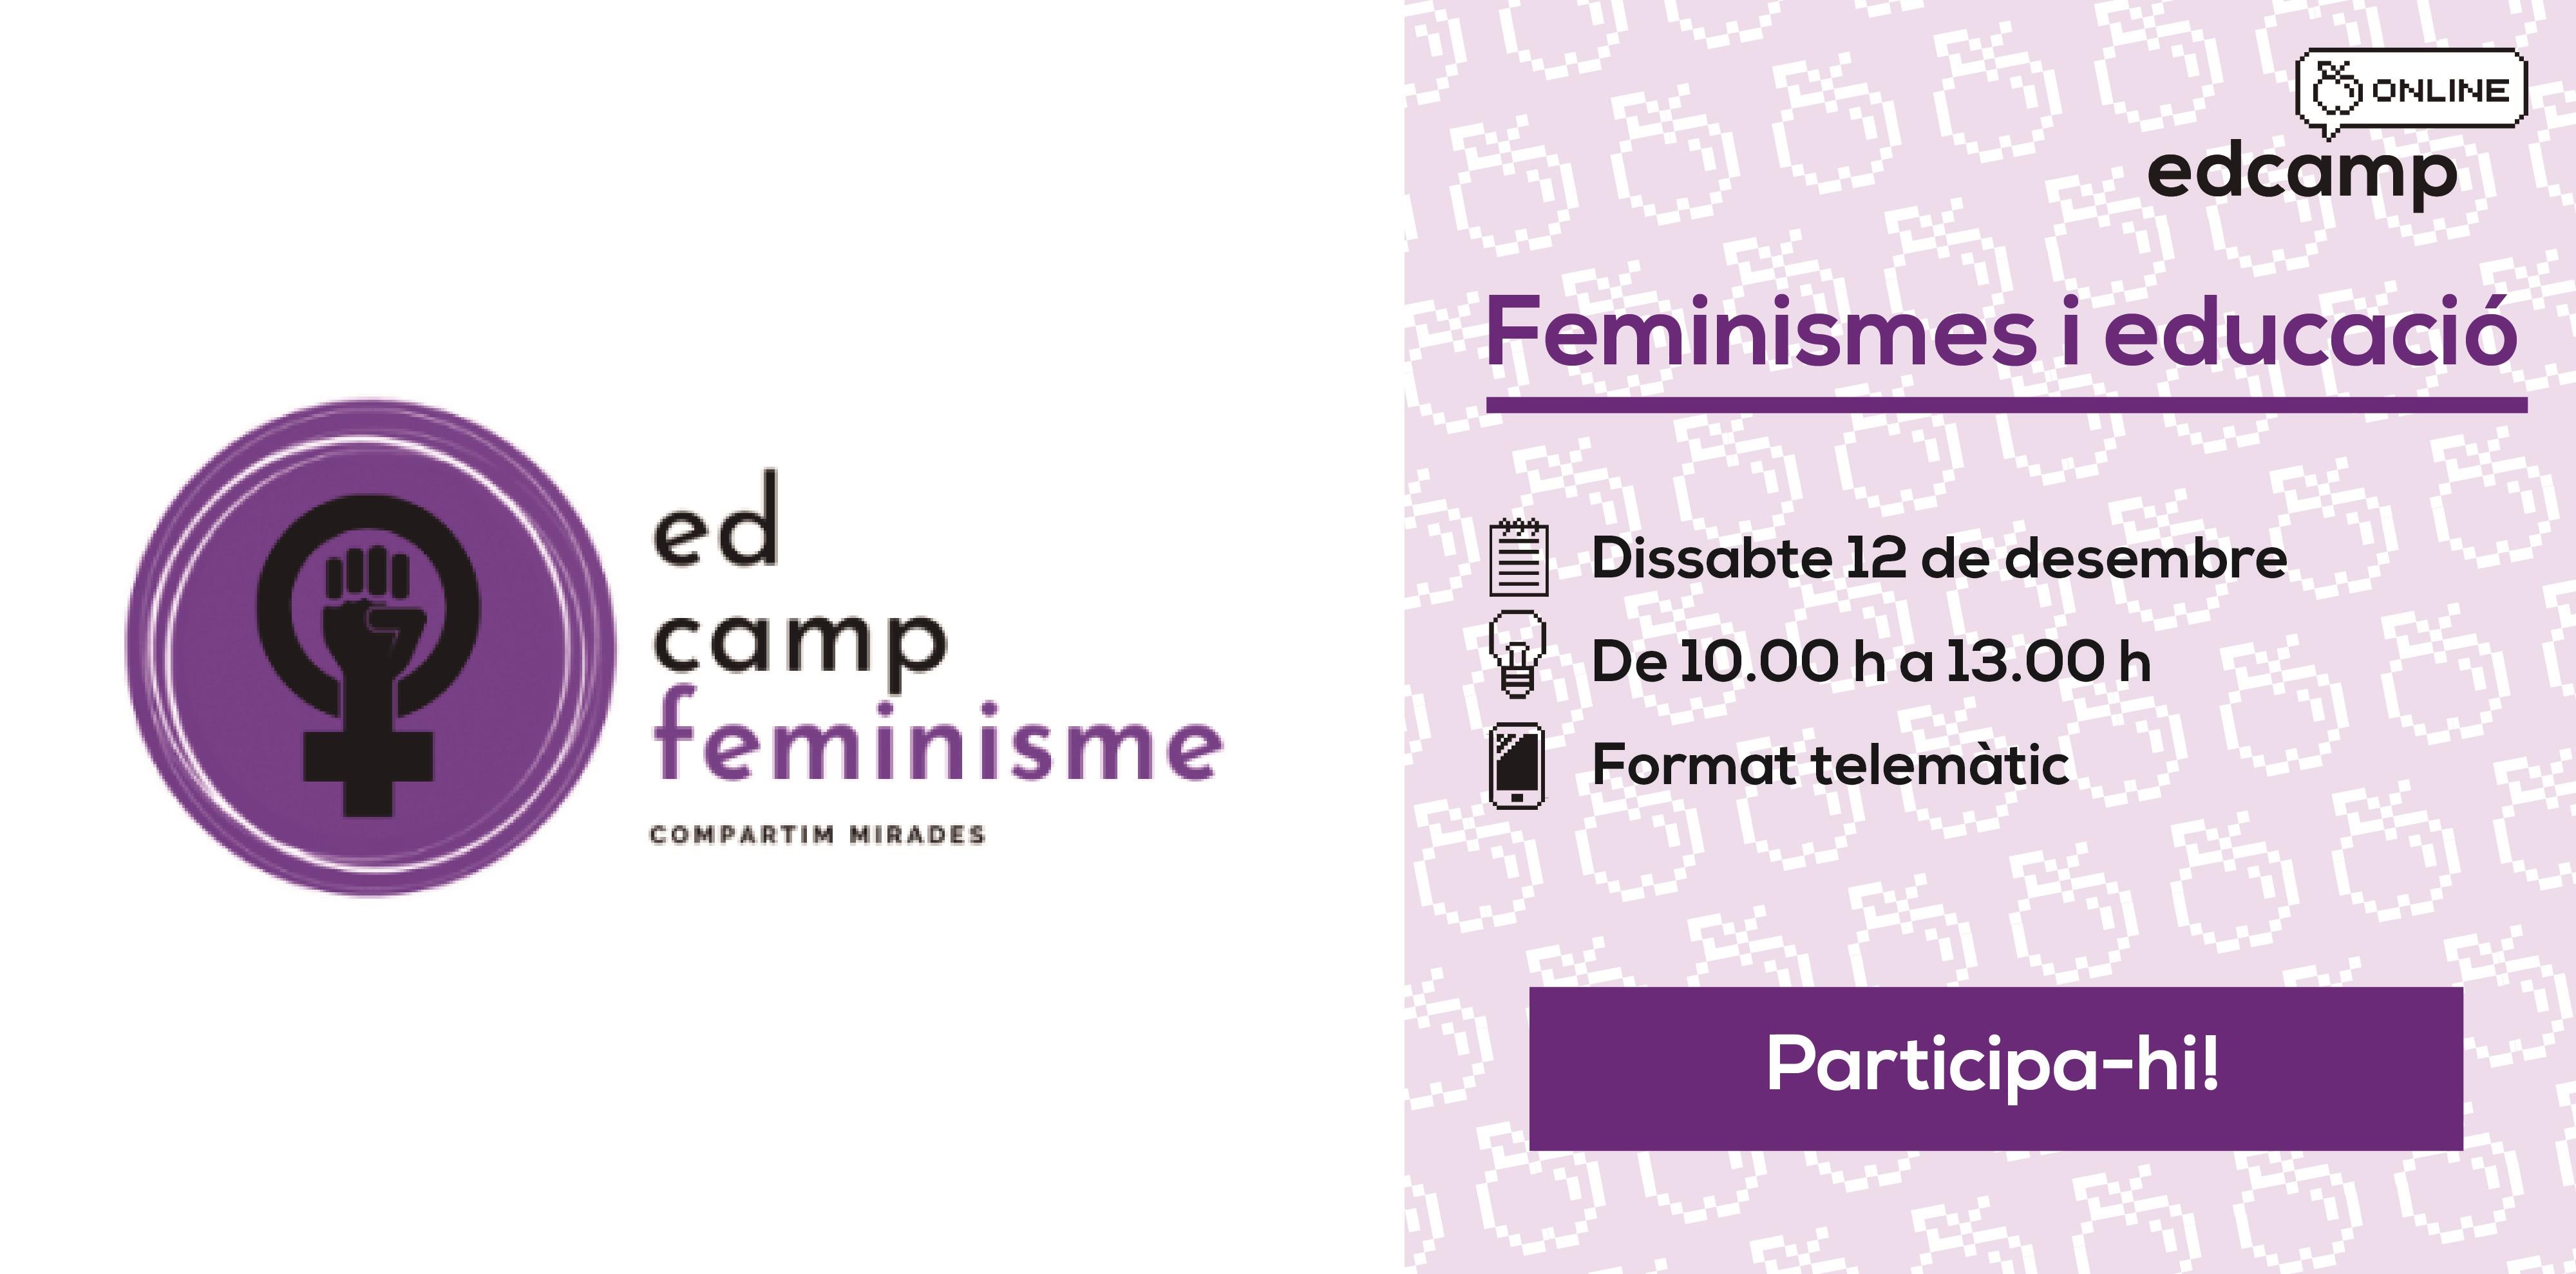 rut-edcamp-feminismesok3.jpg